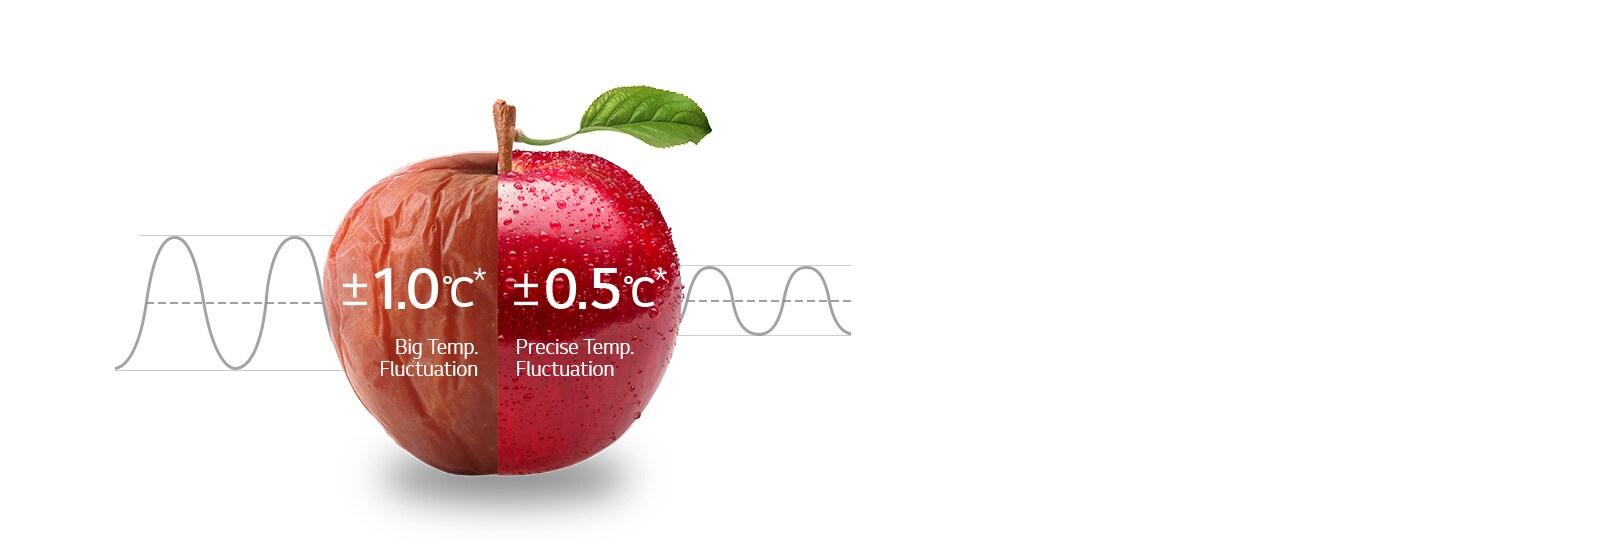 REF-Vplus-MetaltouchSTS-02-5-LinearCooling-Desktop